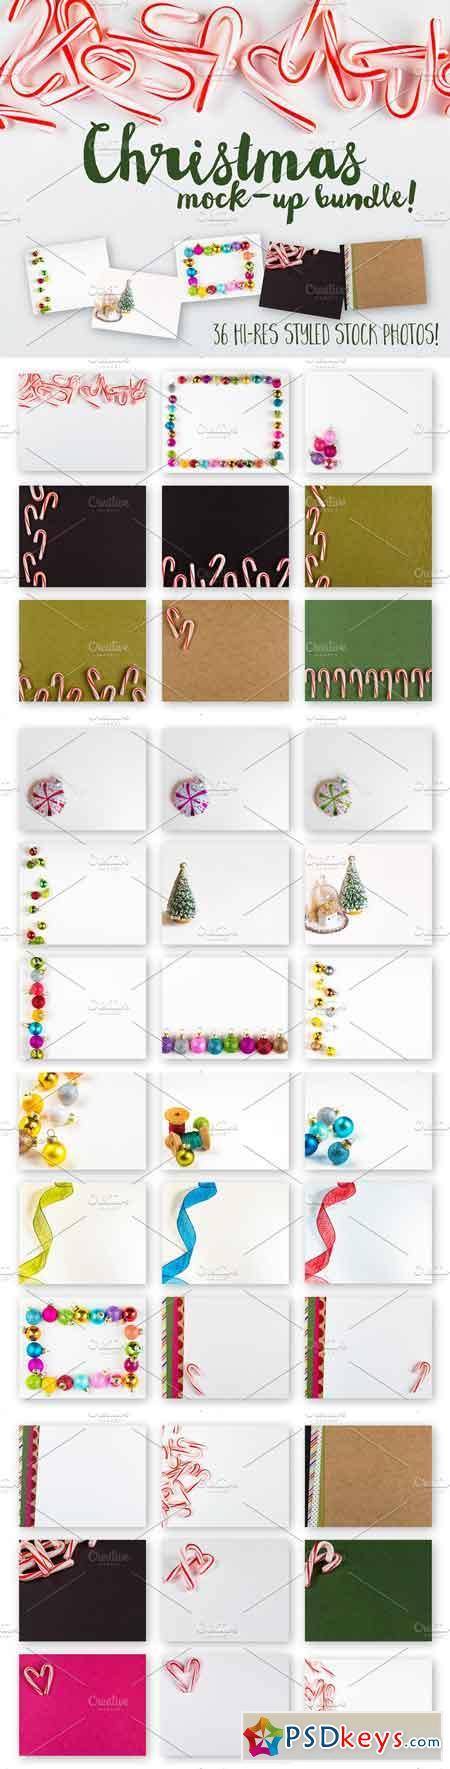 Christmas Stock Photo Mockup Bundle 1064911